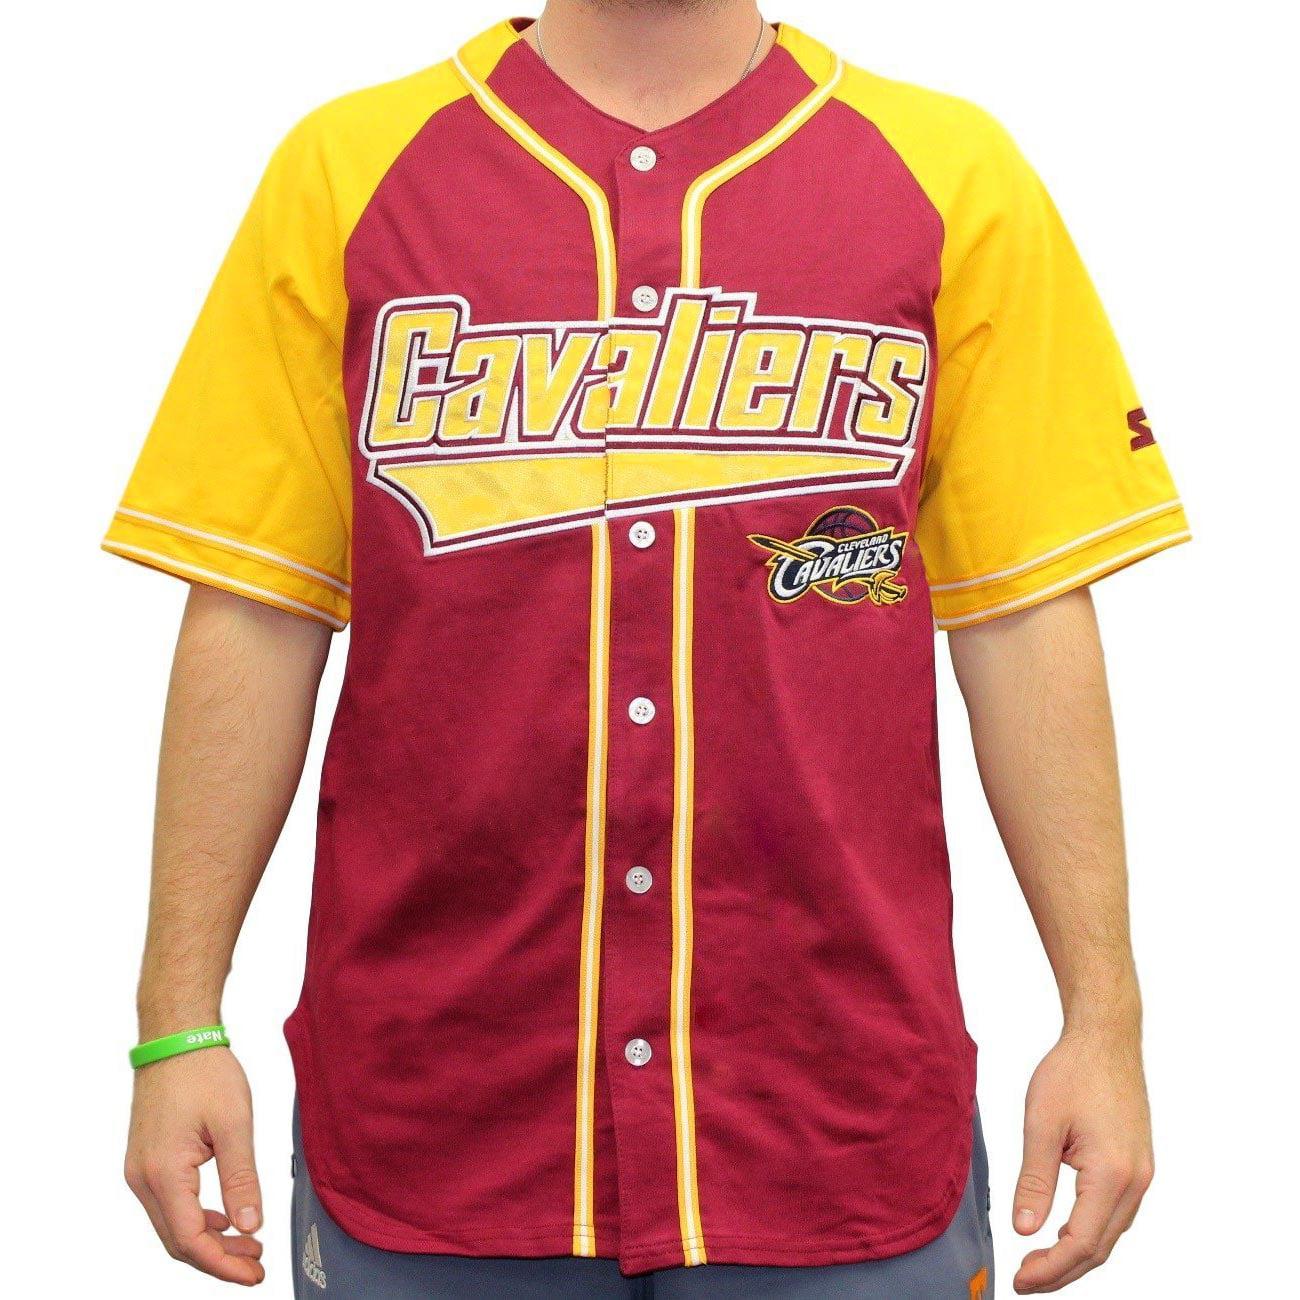 9207f75b482583 ... discount cleveland cavaliers starter nba double play baseball jersey  910f7 594c9